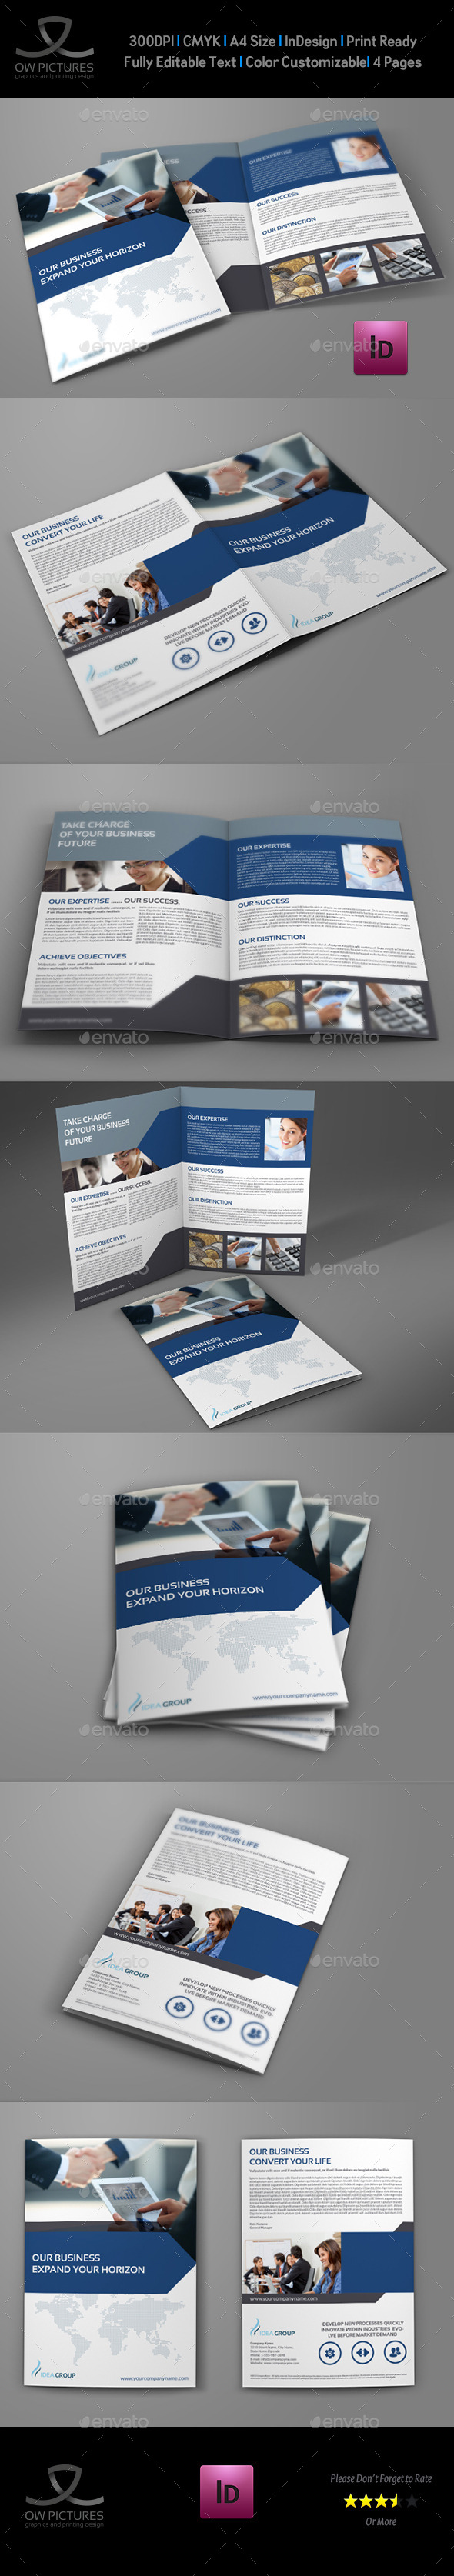 Company Brochure Bi-Fold Template Vol.33 - Corporate Brochures